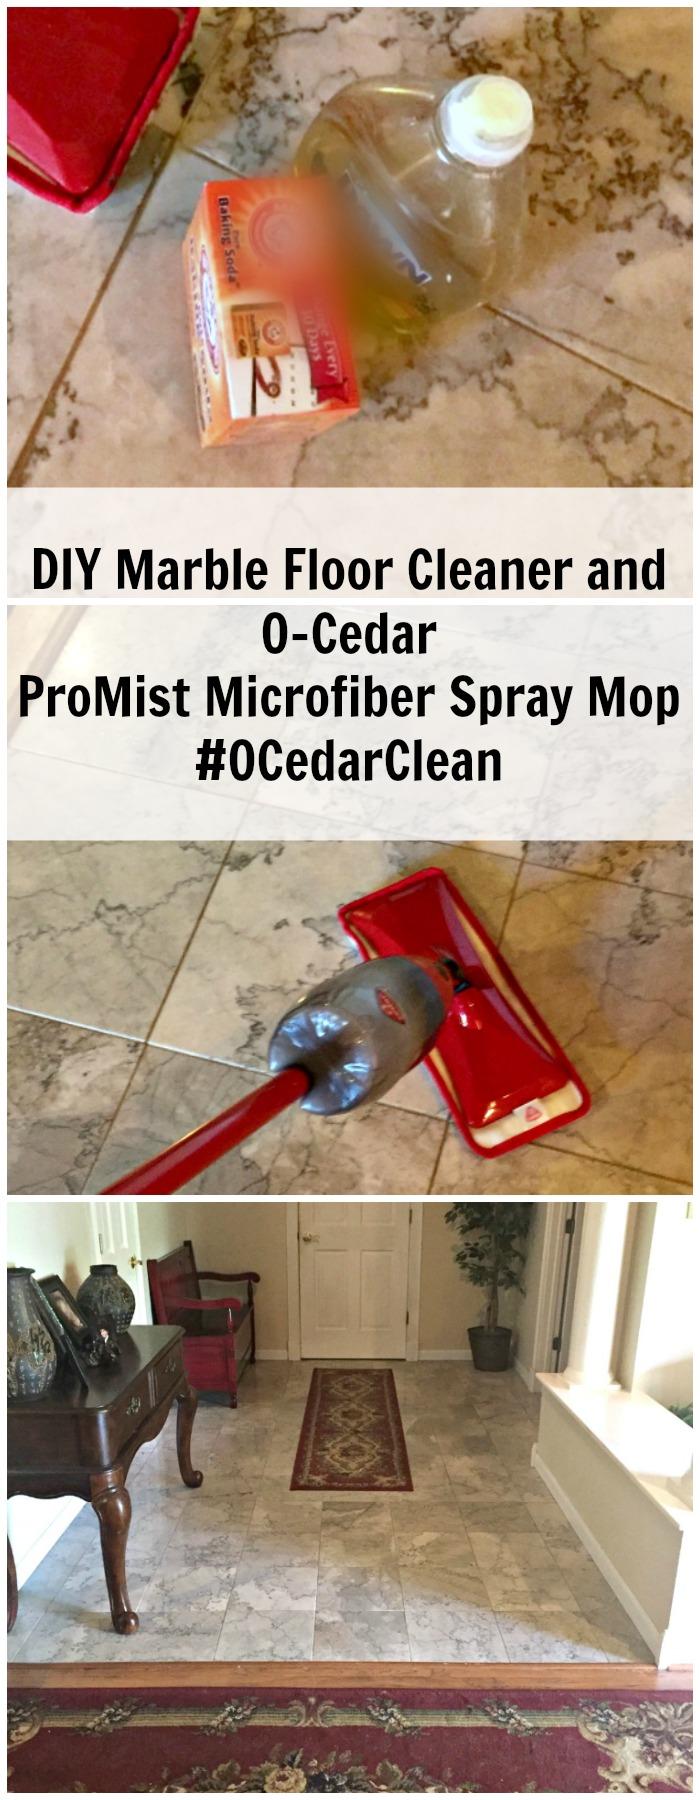 O-Cedar ProMist Microfiber Spray Mop from Walmart